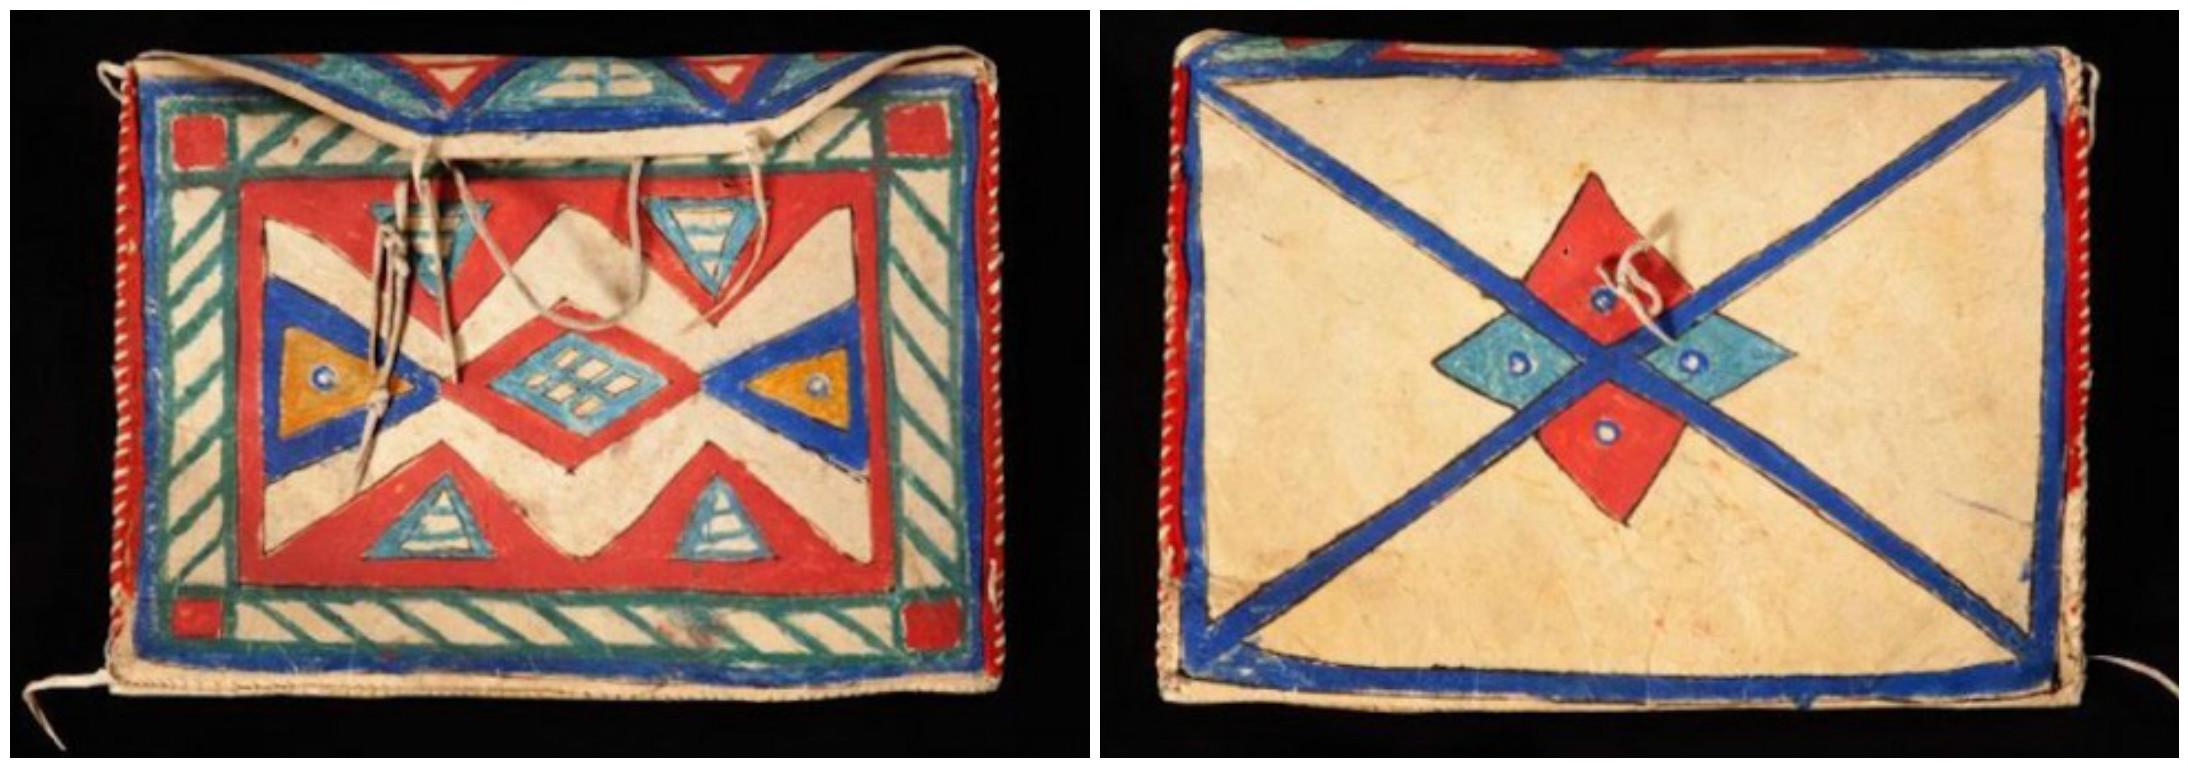 "Lakota document-case parfleche, 14"" x 9.5"", circa 1900. (Courtesy of John Molloy Gallery)"